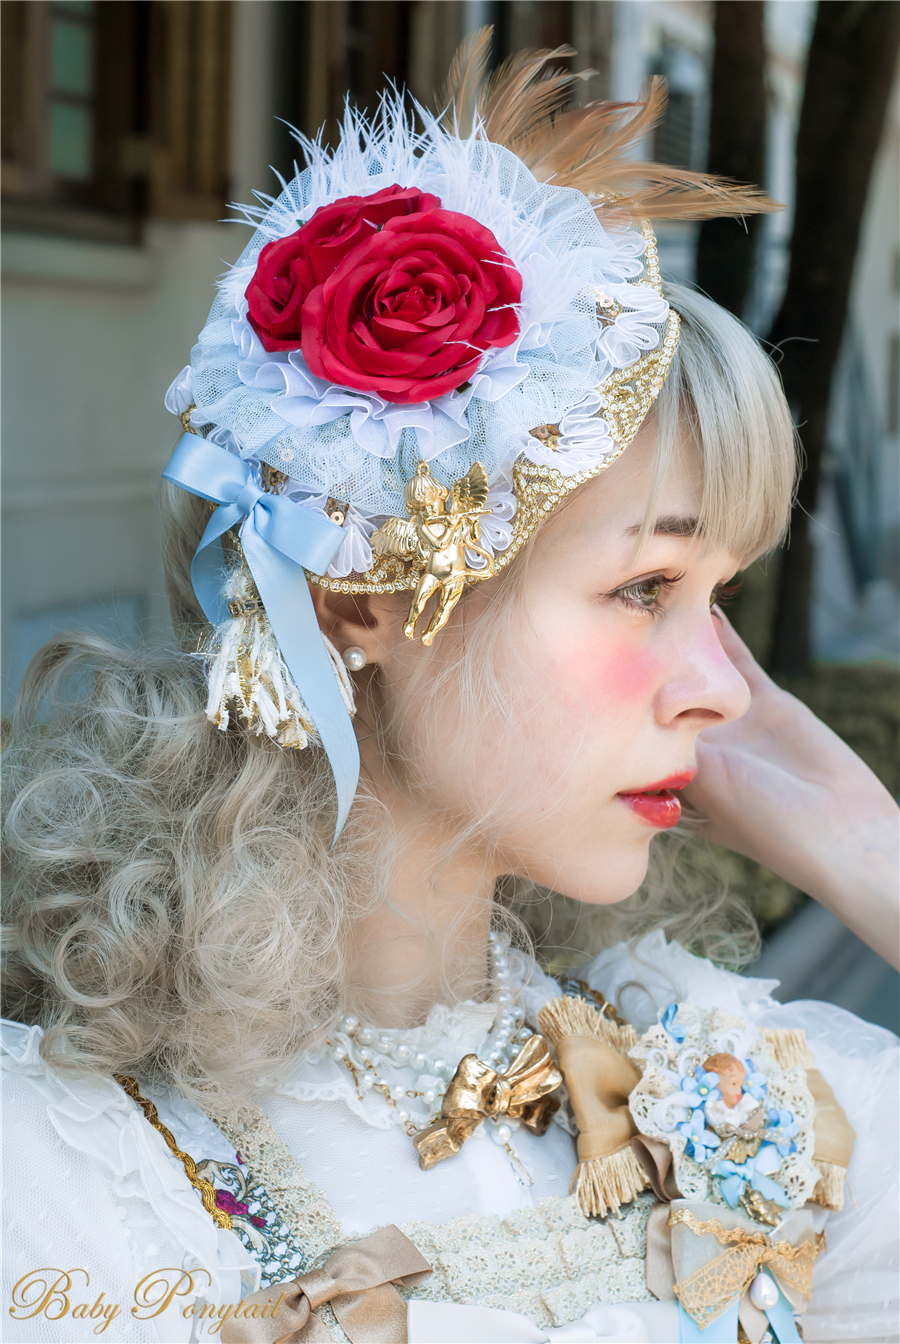 Baby Ponytail_Circus Princess_Silver JSK_Claudia09.jpg